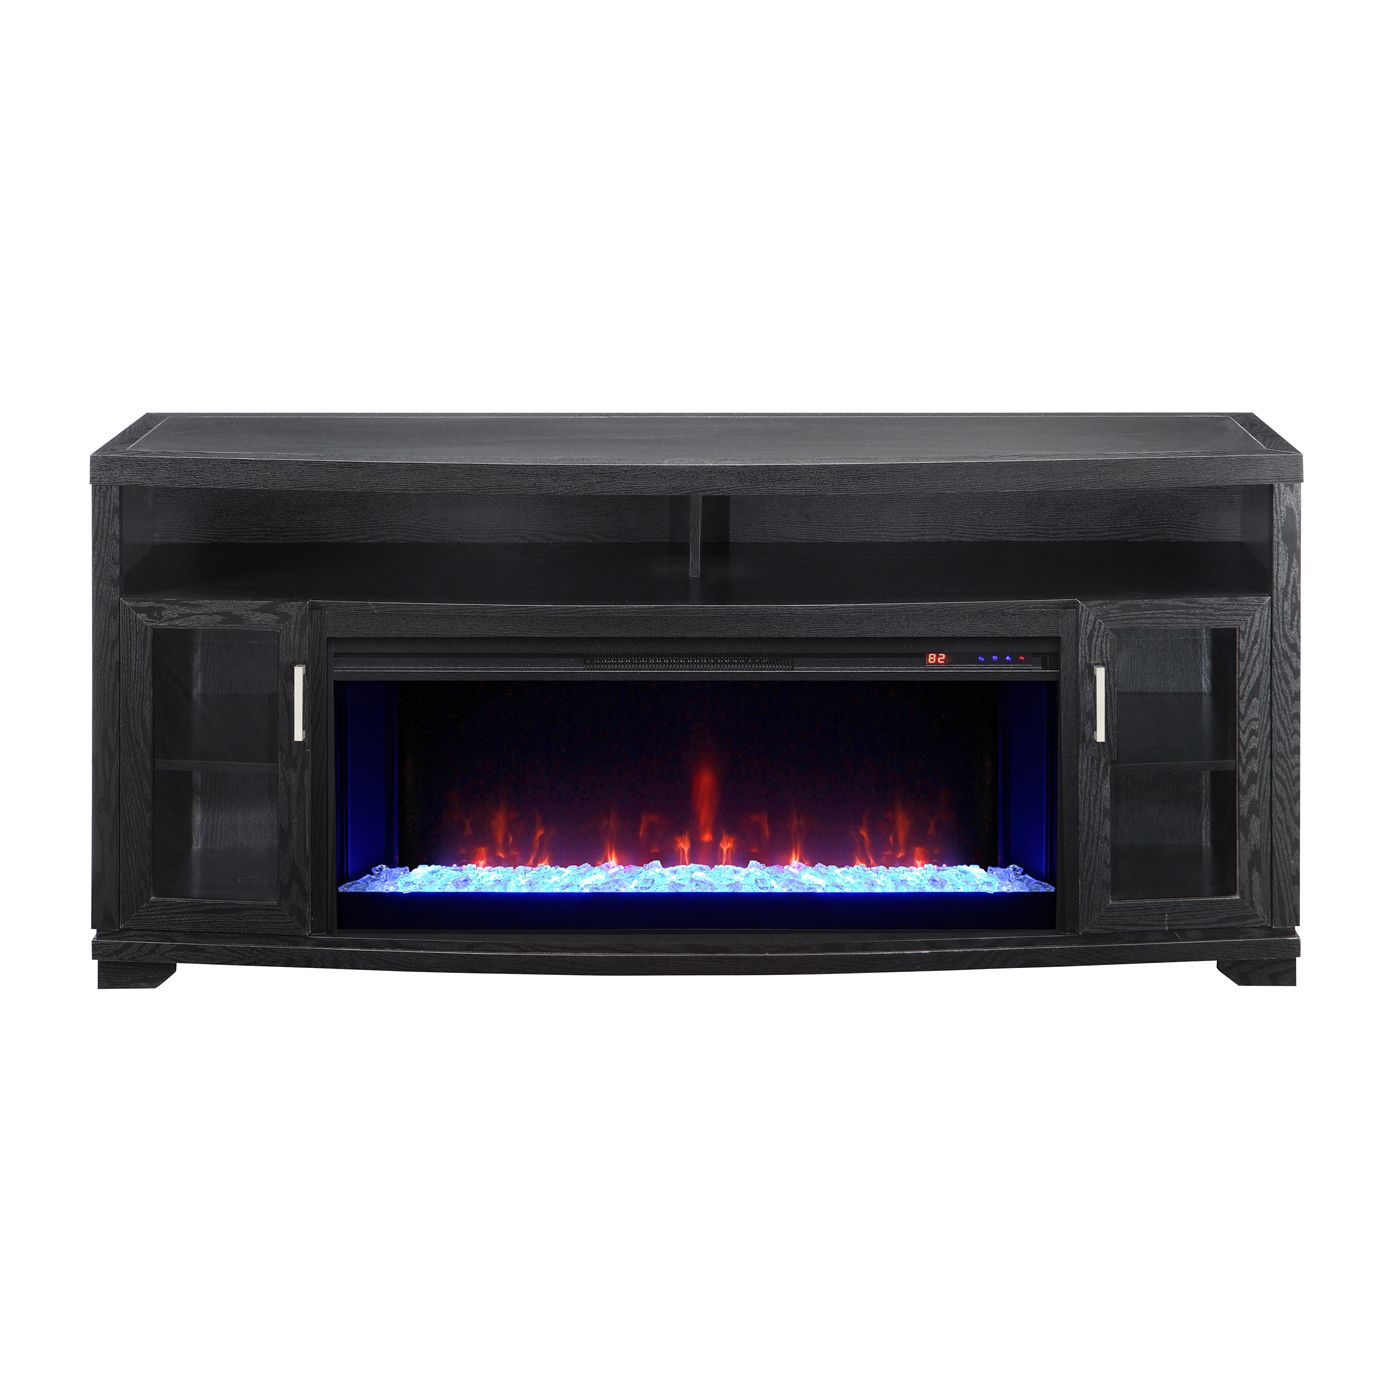 Magnificent Muskoka Mtvs4242Se Durant Electric Fireplace Media Mantel Download Free Architecture Designs Itiscsunscenecom